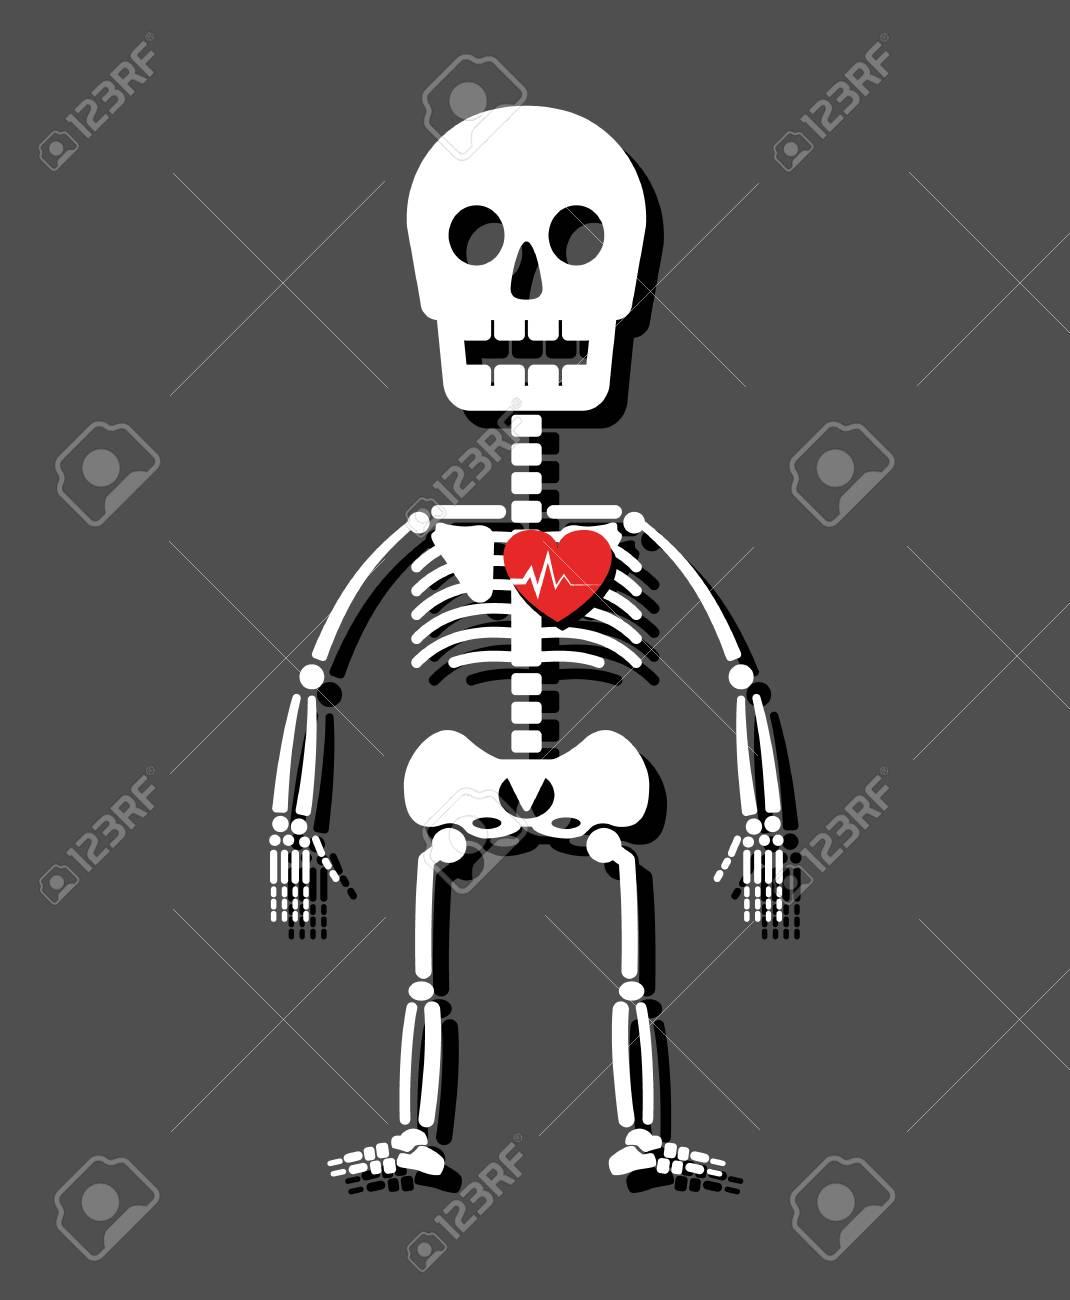 Human skeleton and heart . Cartoon style . - 80716140